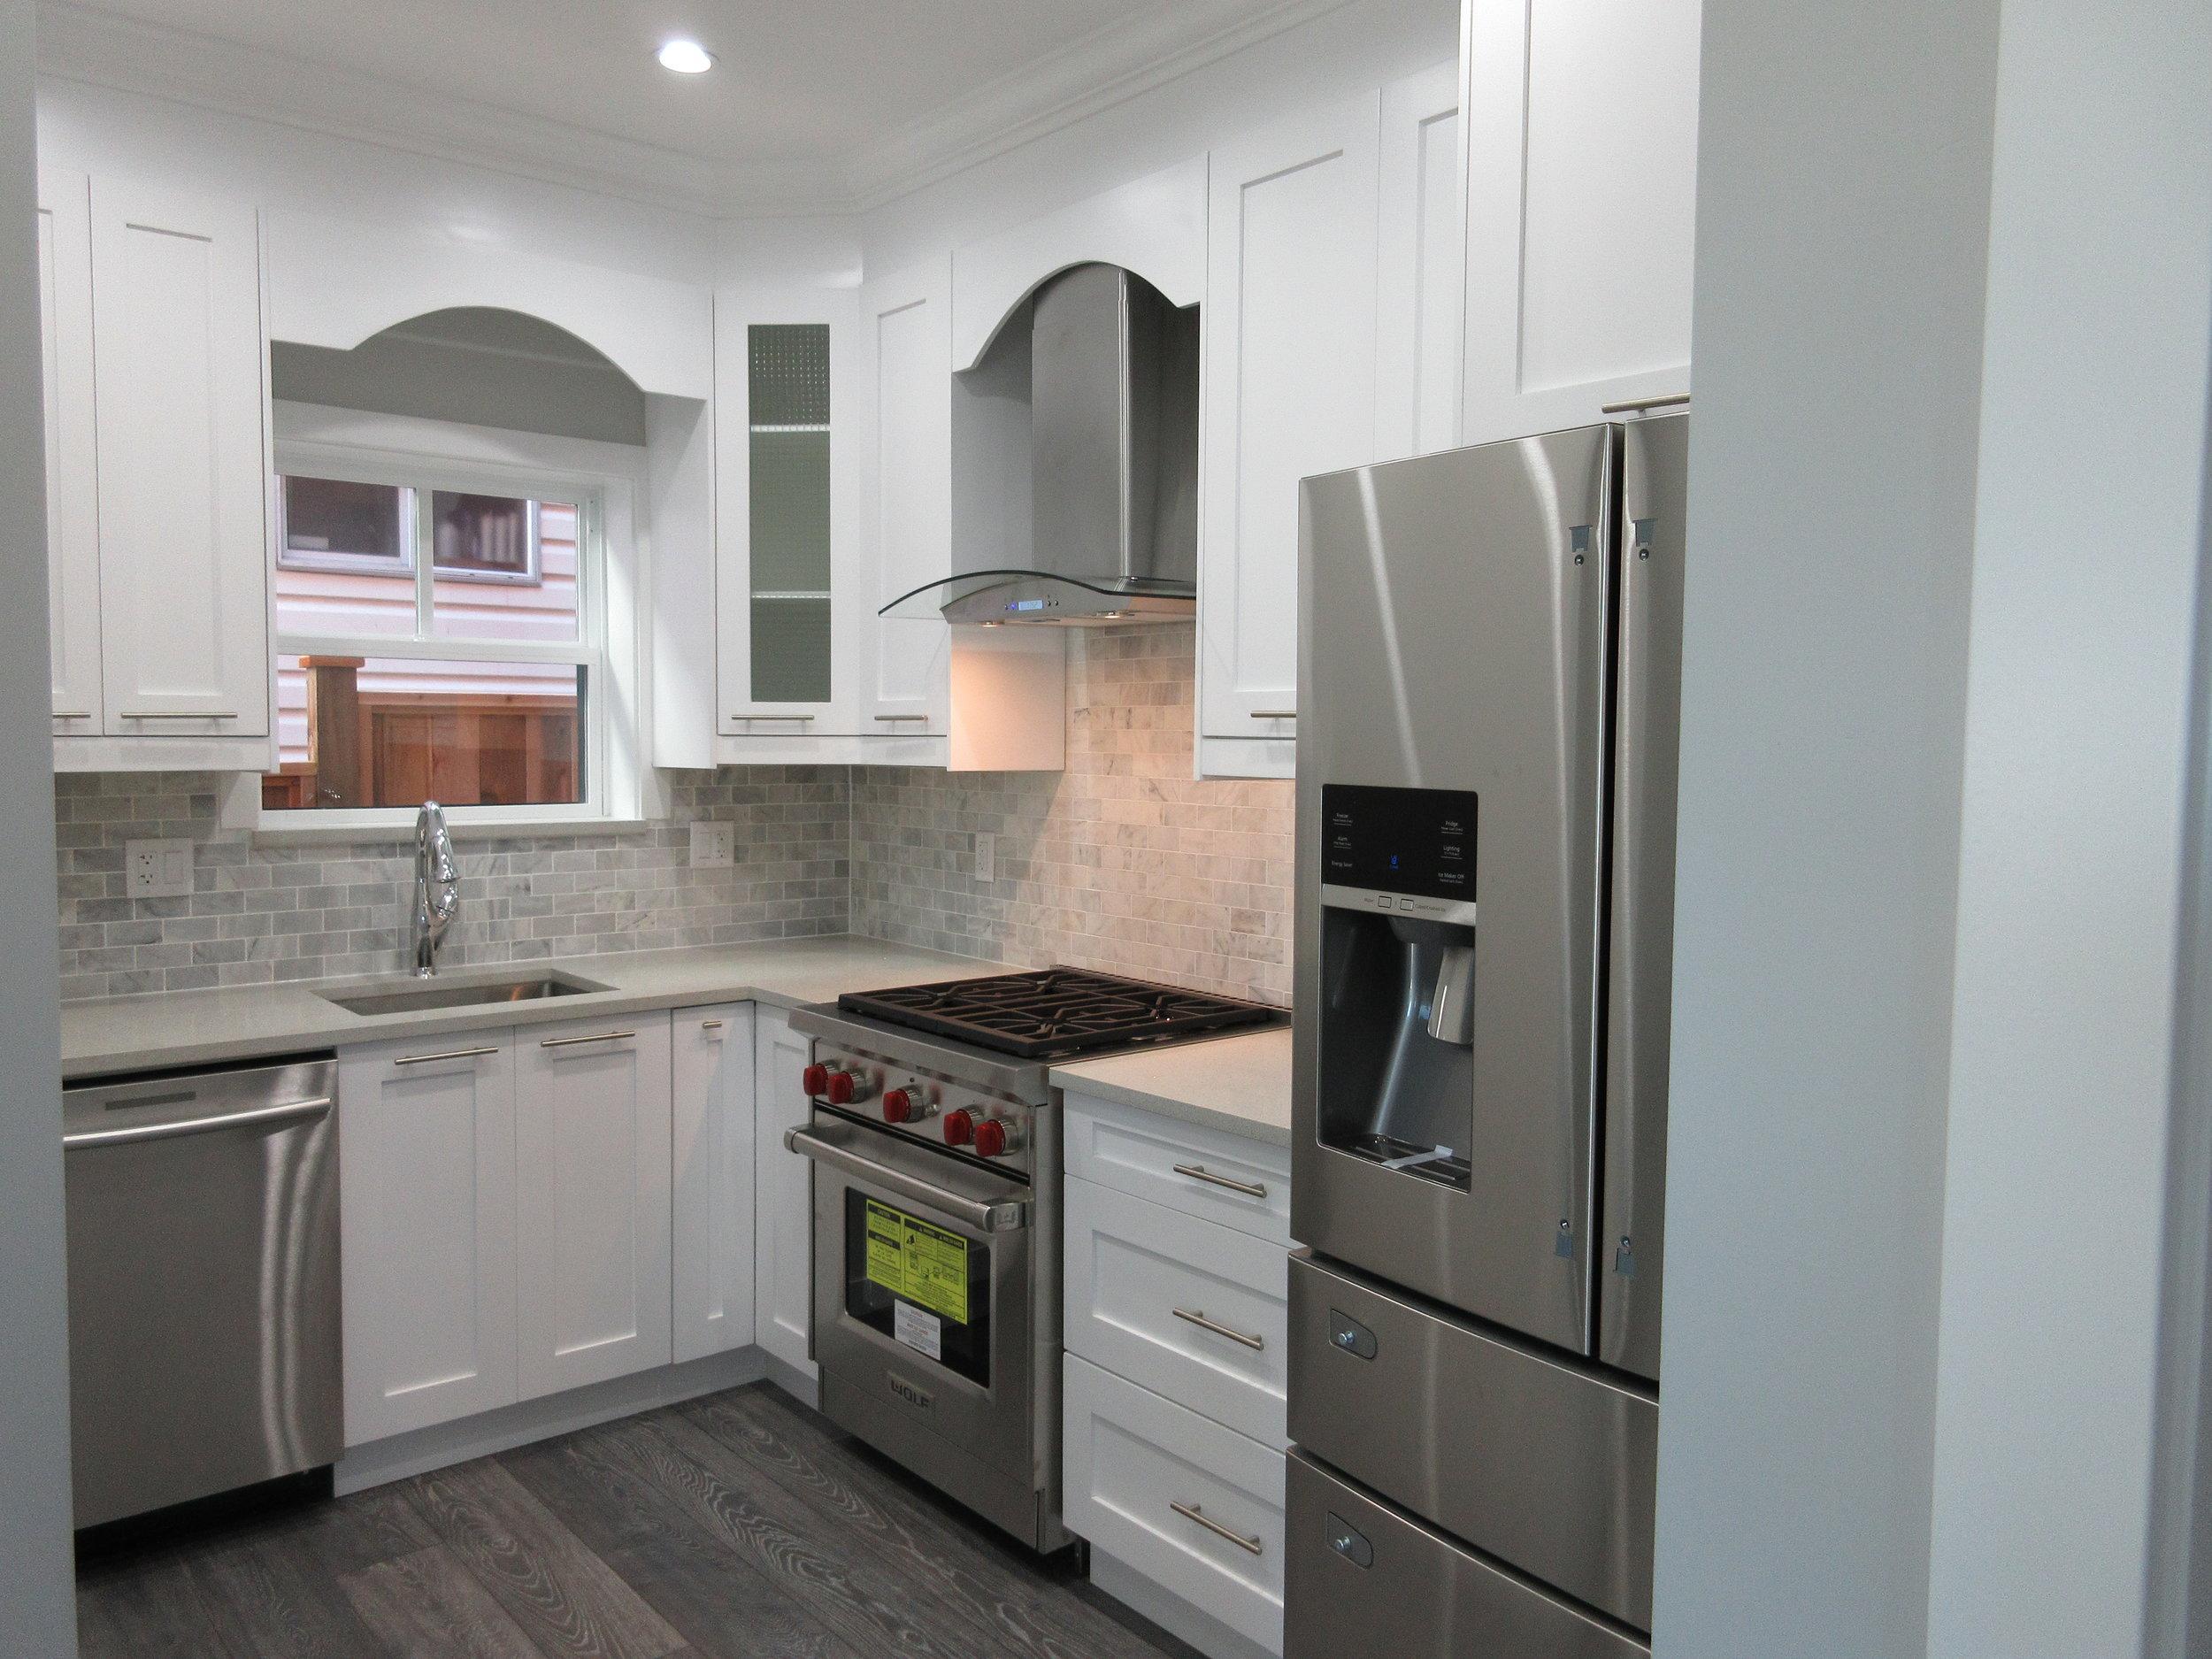 pic08 - gourmet kitchen with gas range, four door refrigerator, and quite dishwasher.JPG